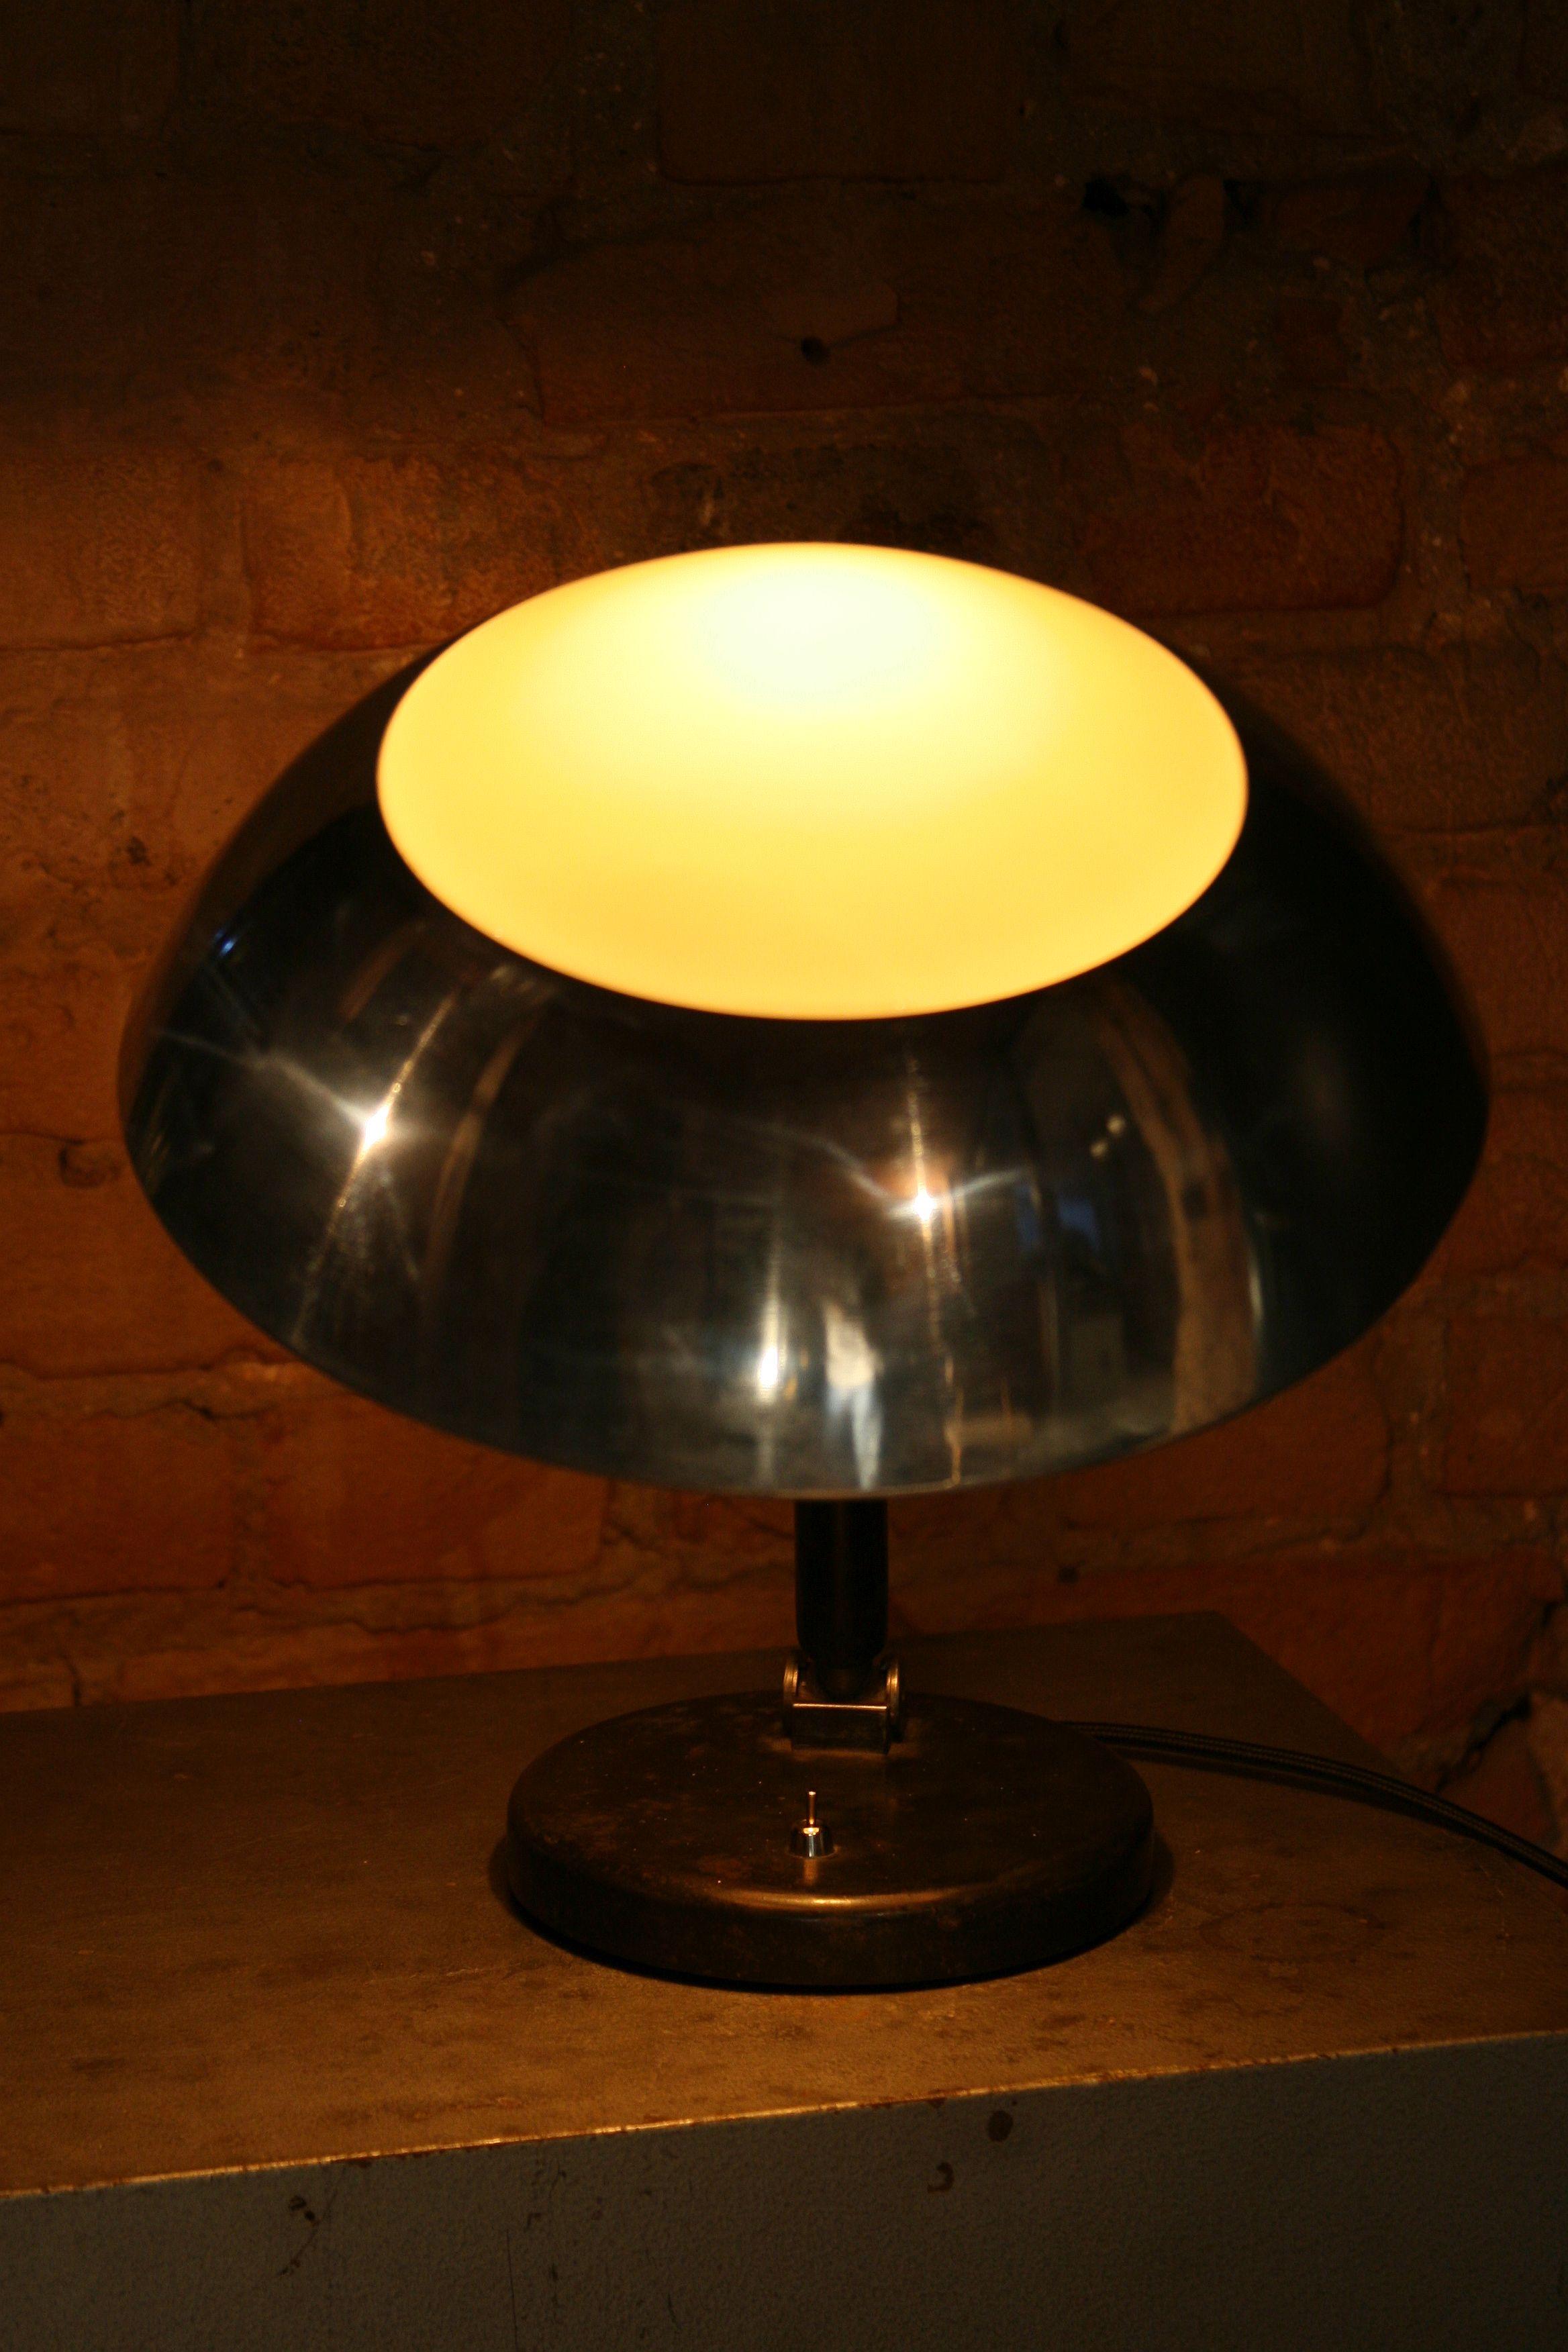 Modne ubrania Lampa Biurkowa Art Deco Projektu Karla Traberta   Upstream Factory YN85